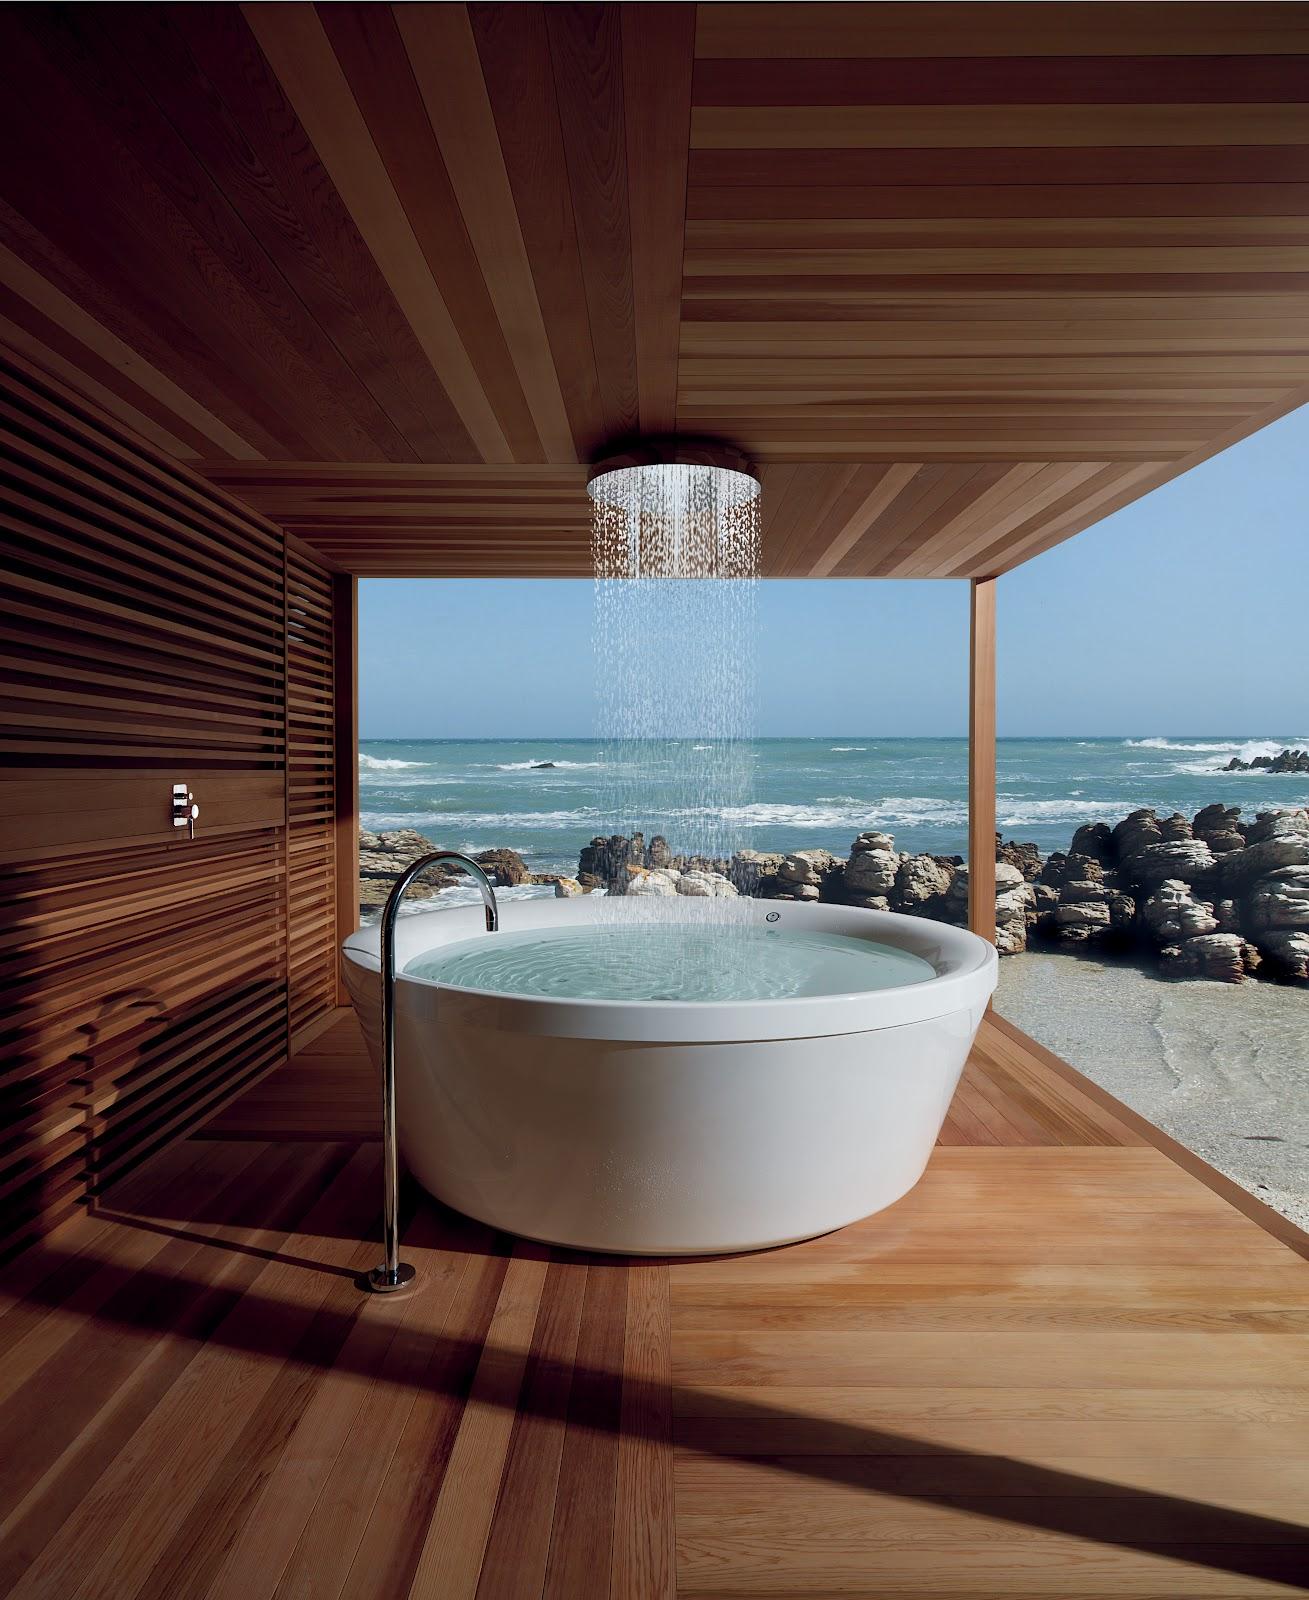 Bathroom Outdoor: Epitome Of Luxury: 30 Refreshing Outdoor Showers